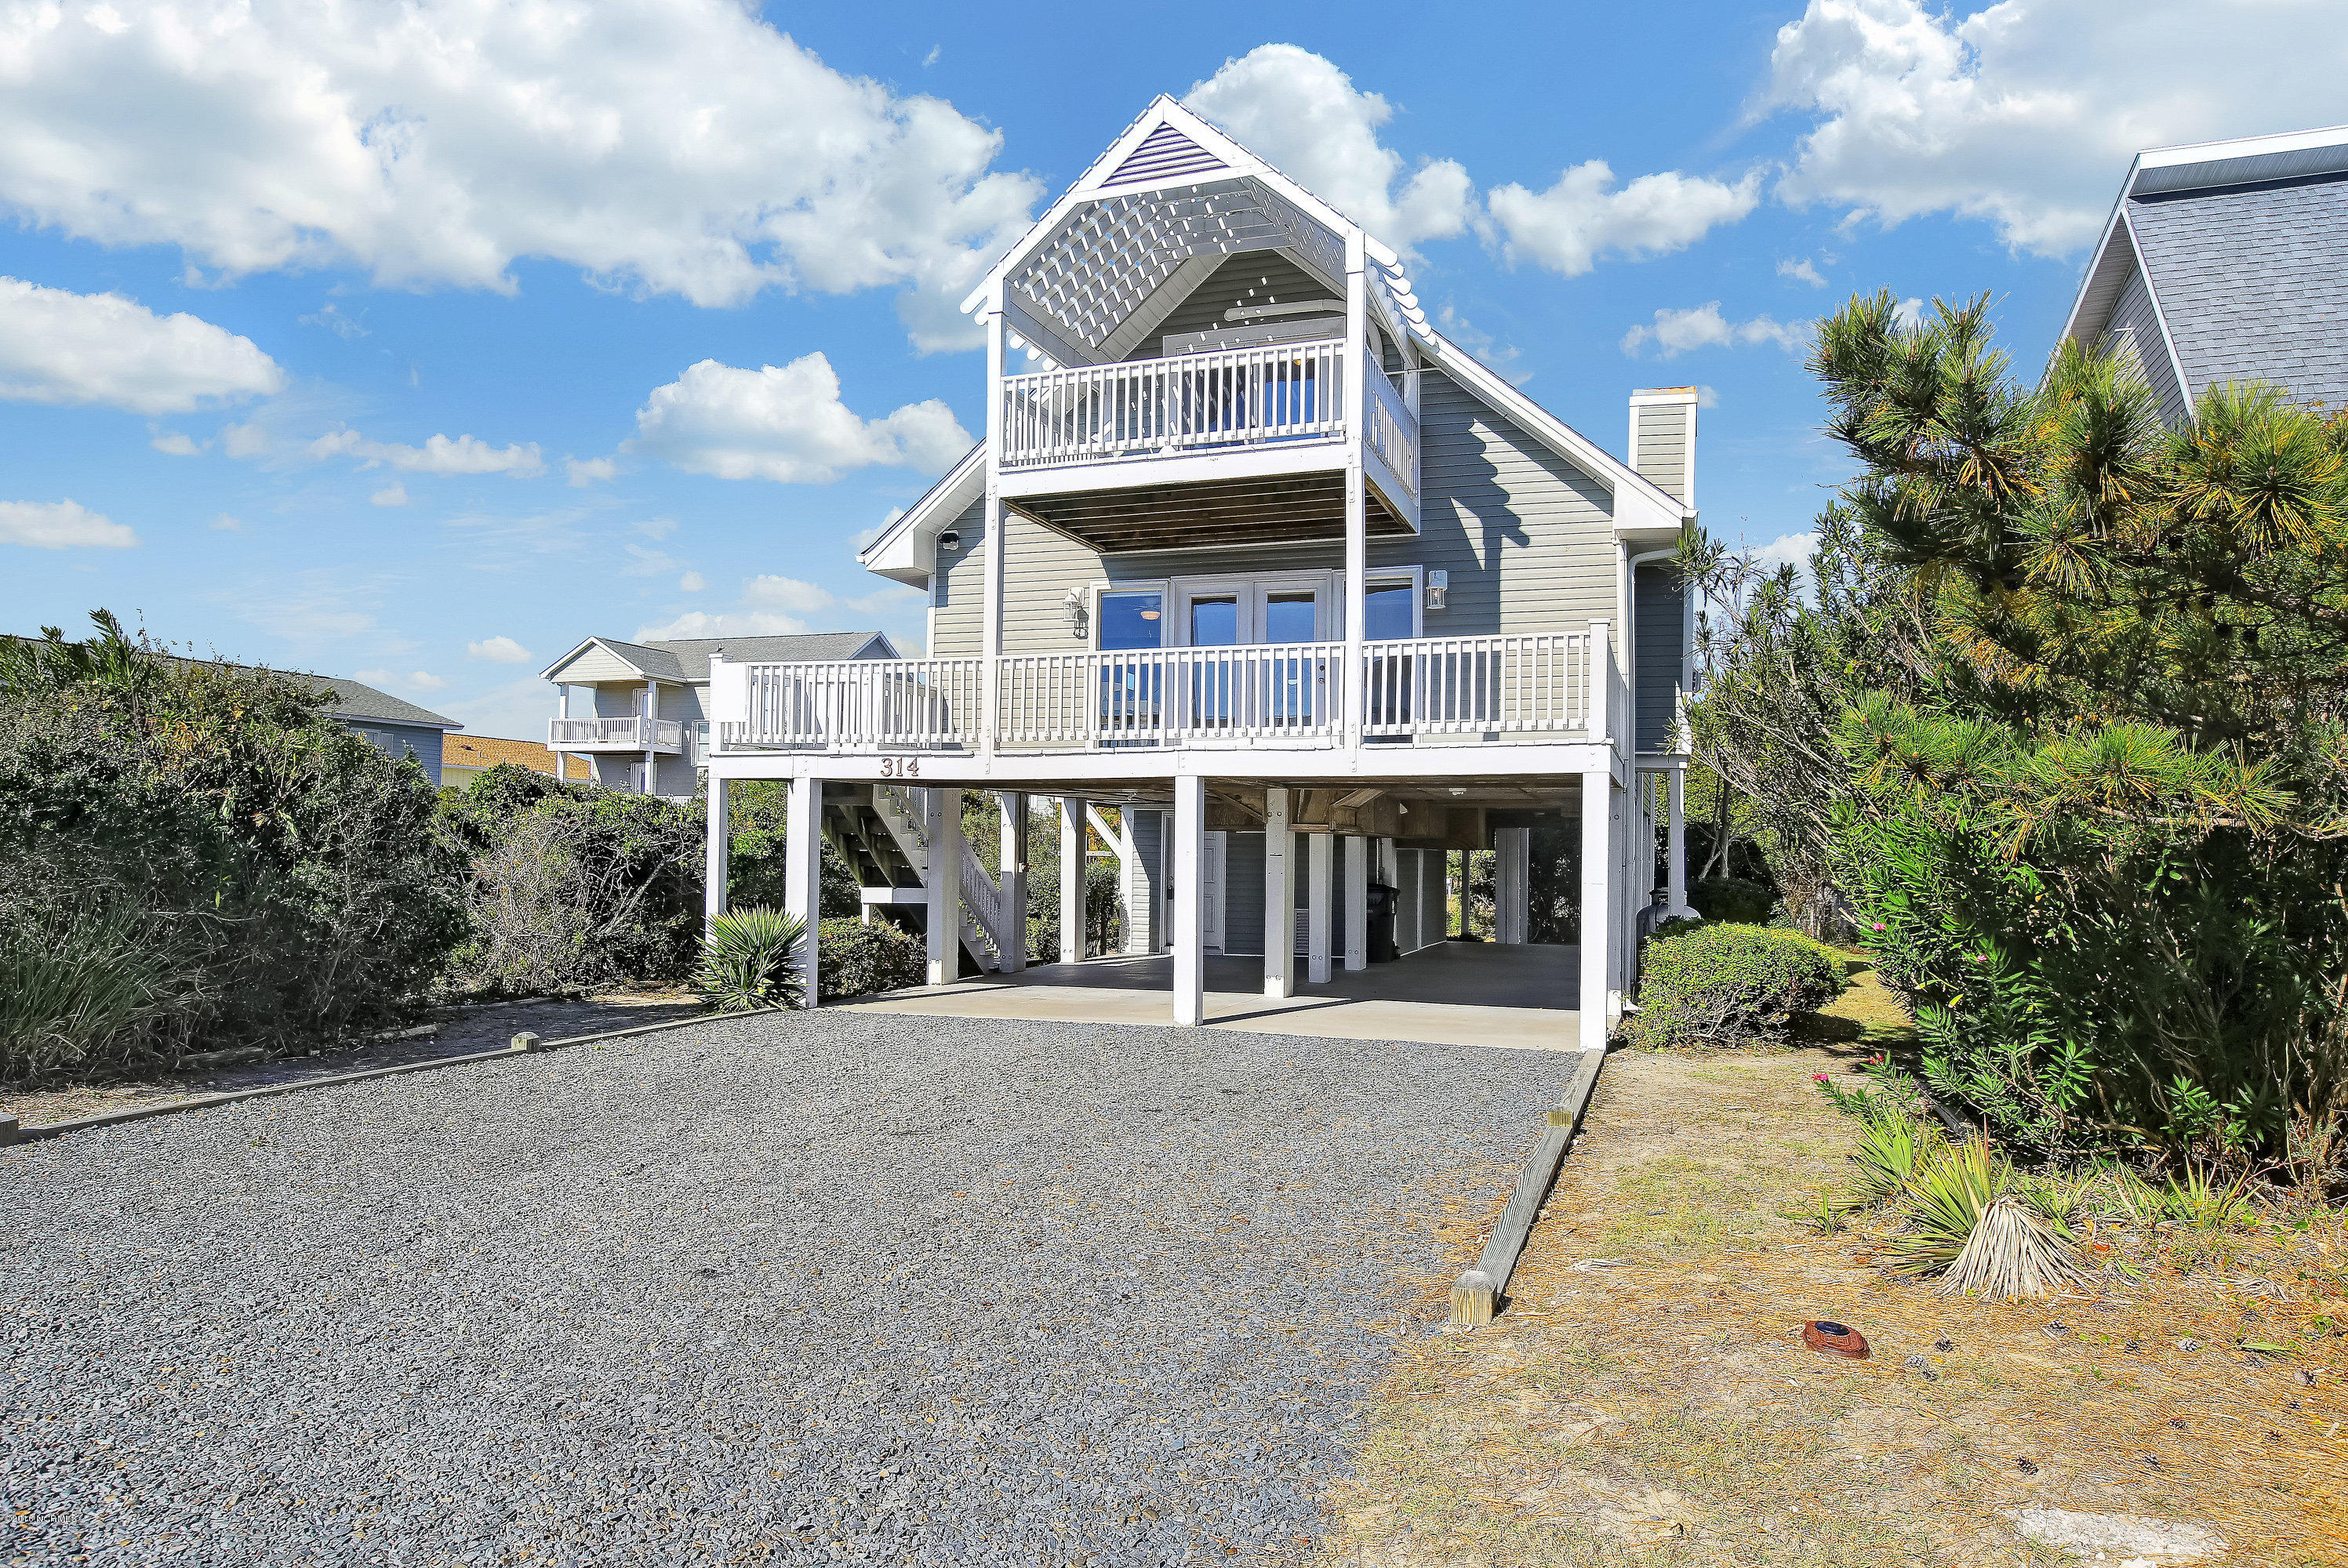 Carolina Plantations Real Estate - MLS Number: 100155813